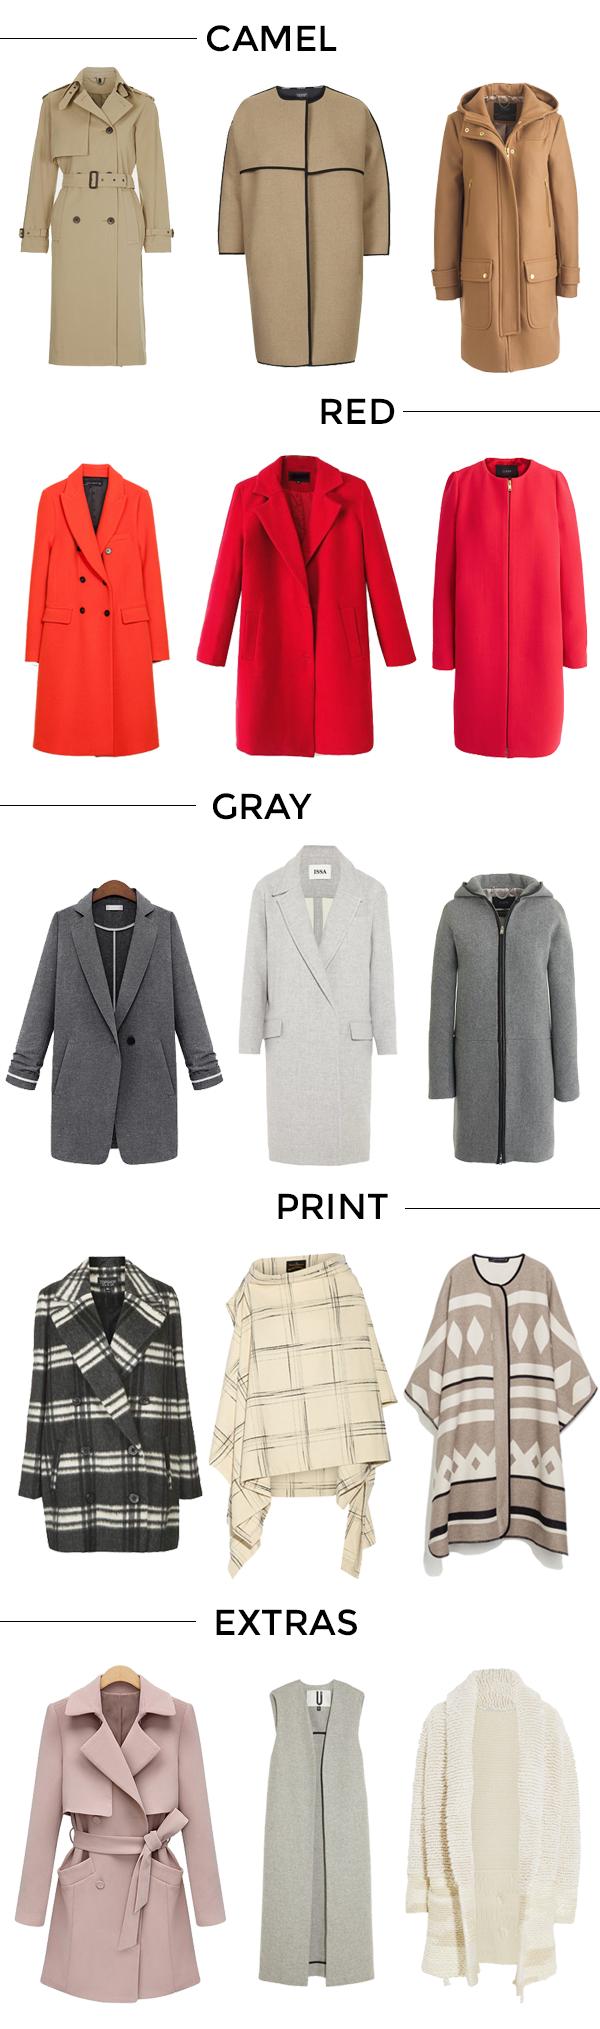 Fall Coat Guide